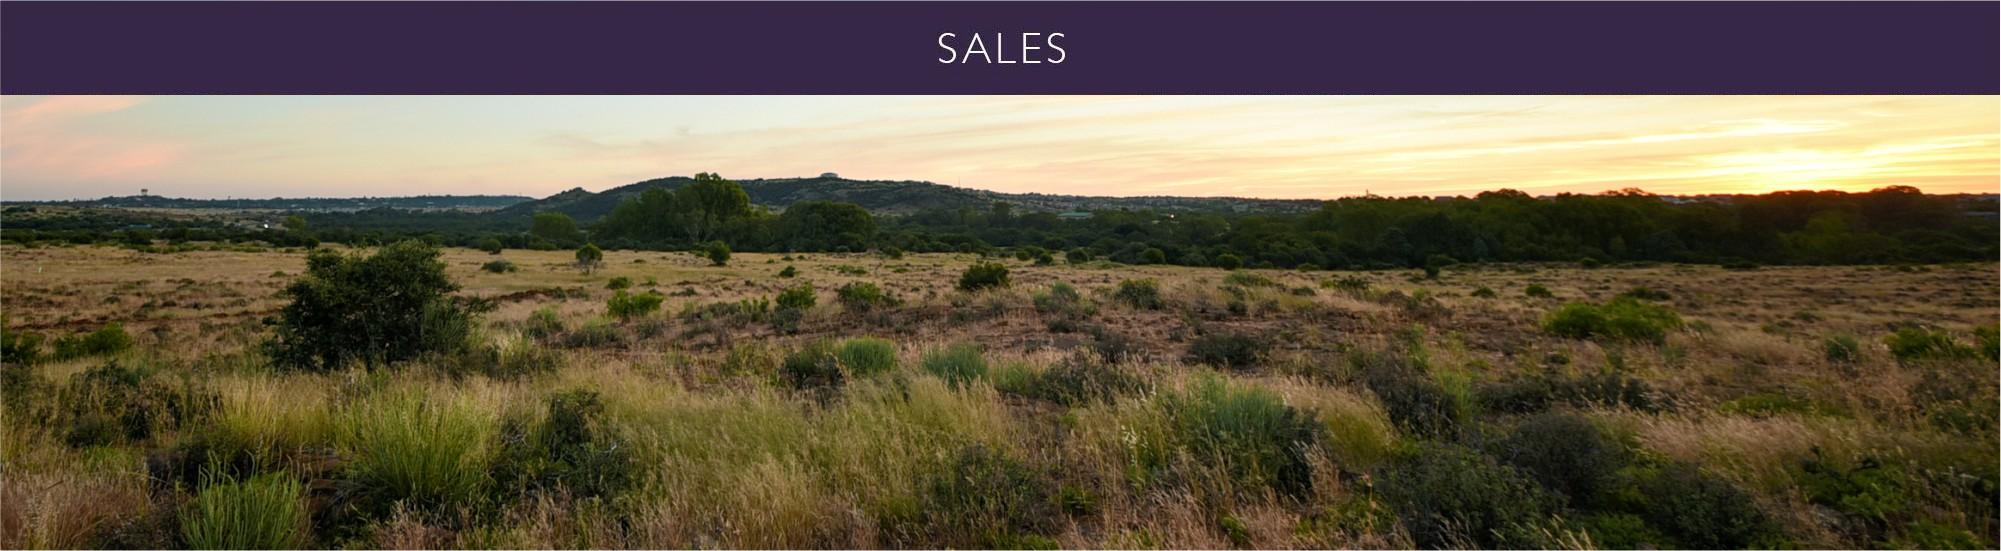 Woodland Hills New Phase Sales